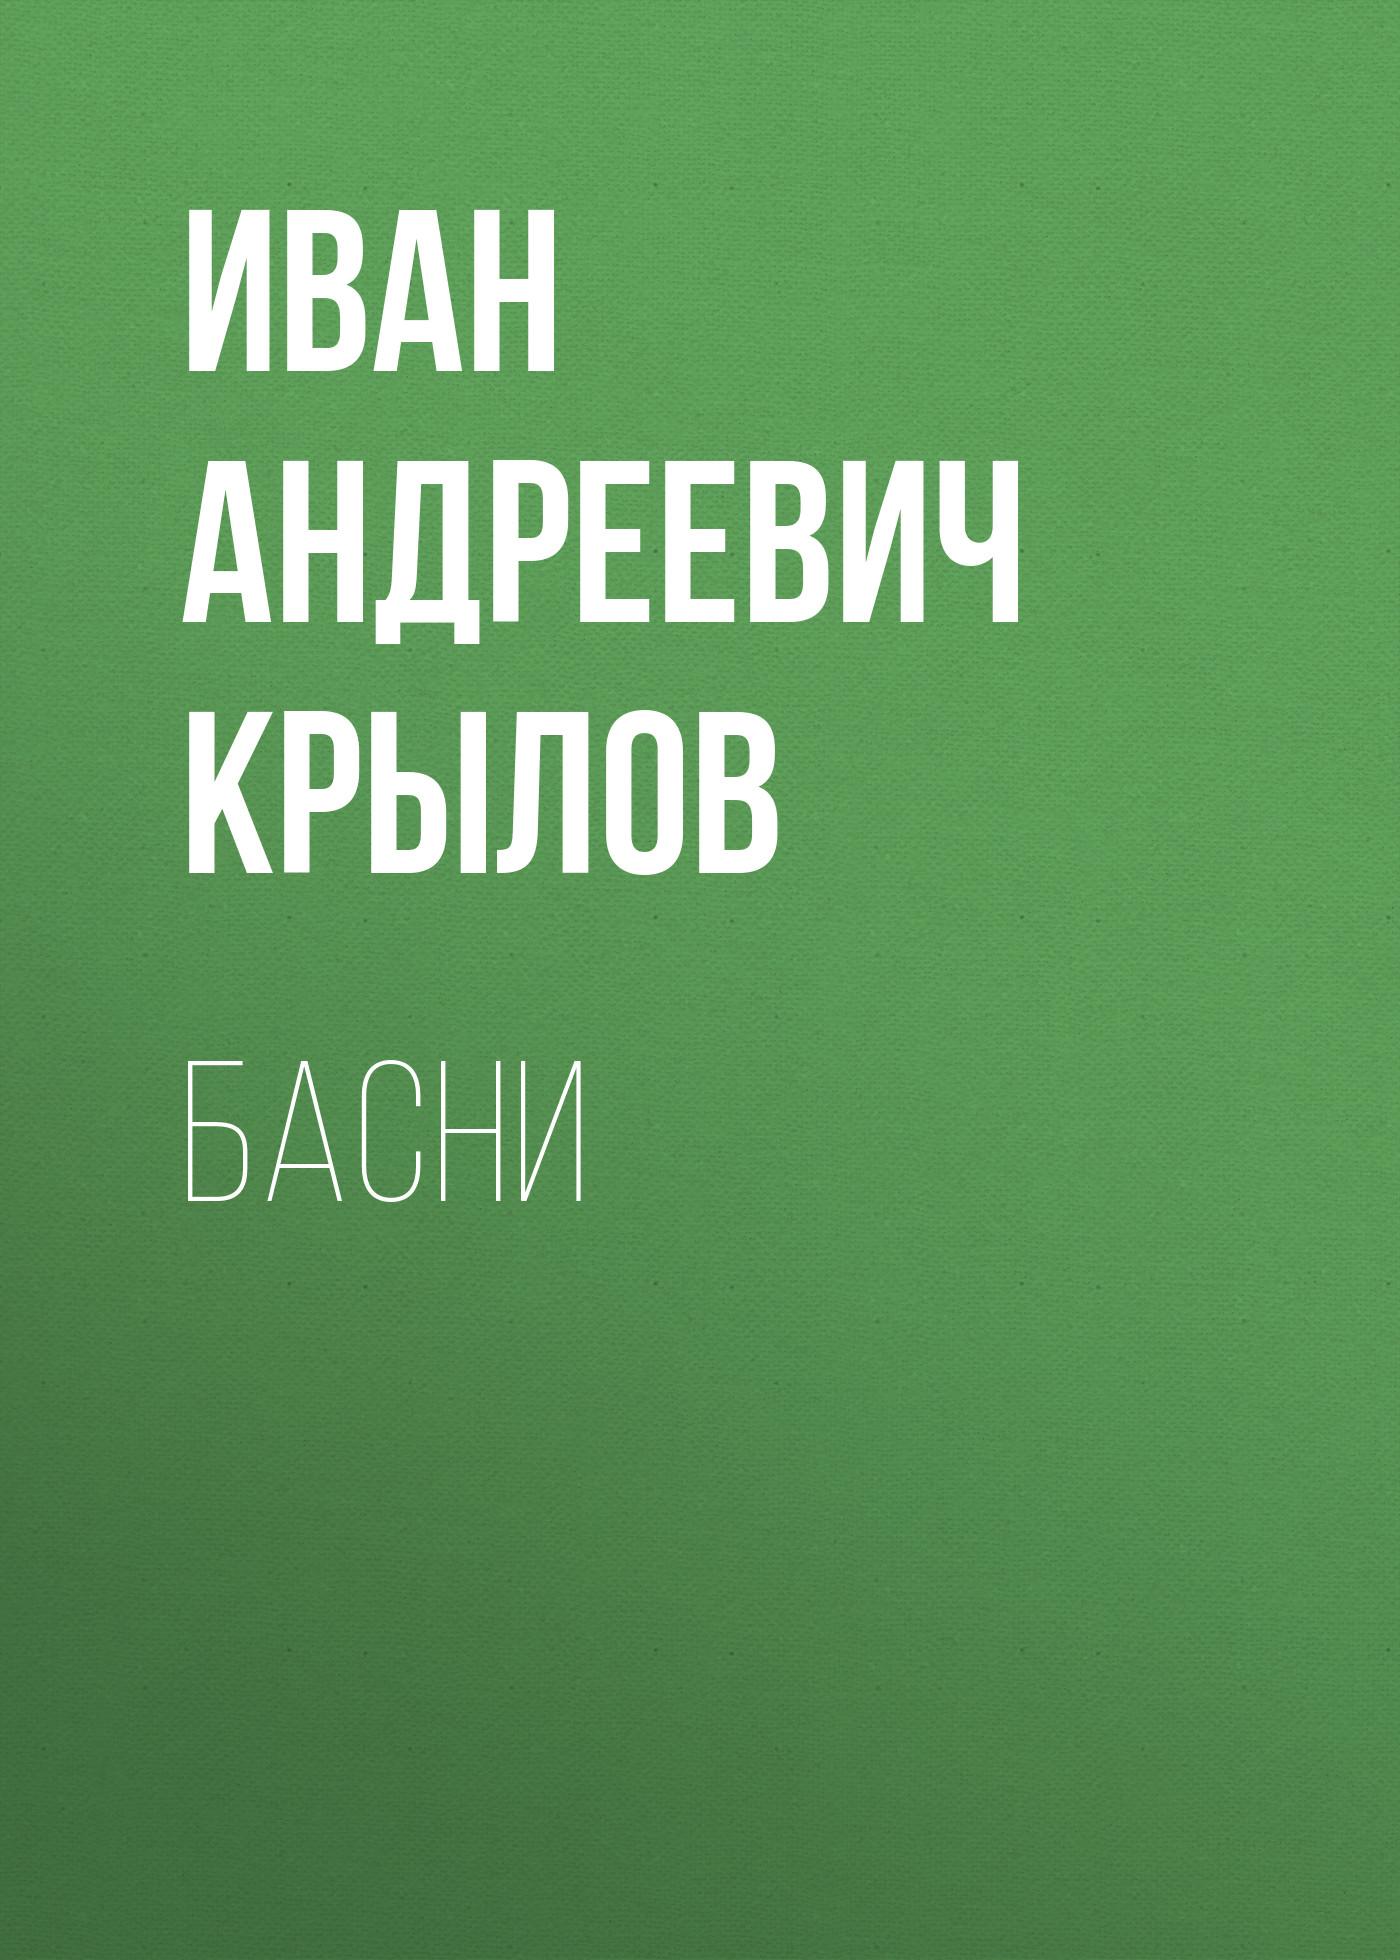 Иван Андреевич Крылов Басни иван крылов иван крылов басни isbn 978 5 04 095942 6